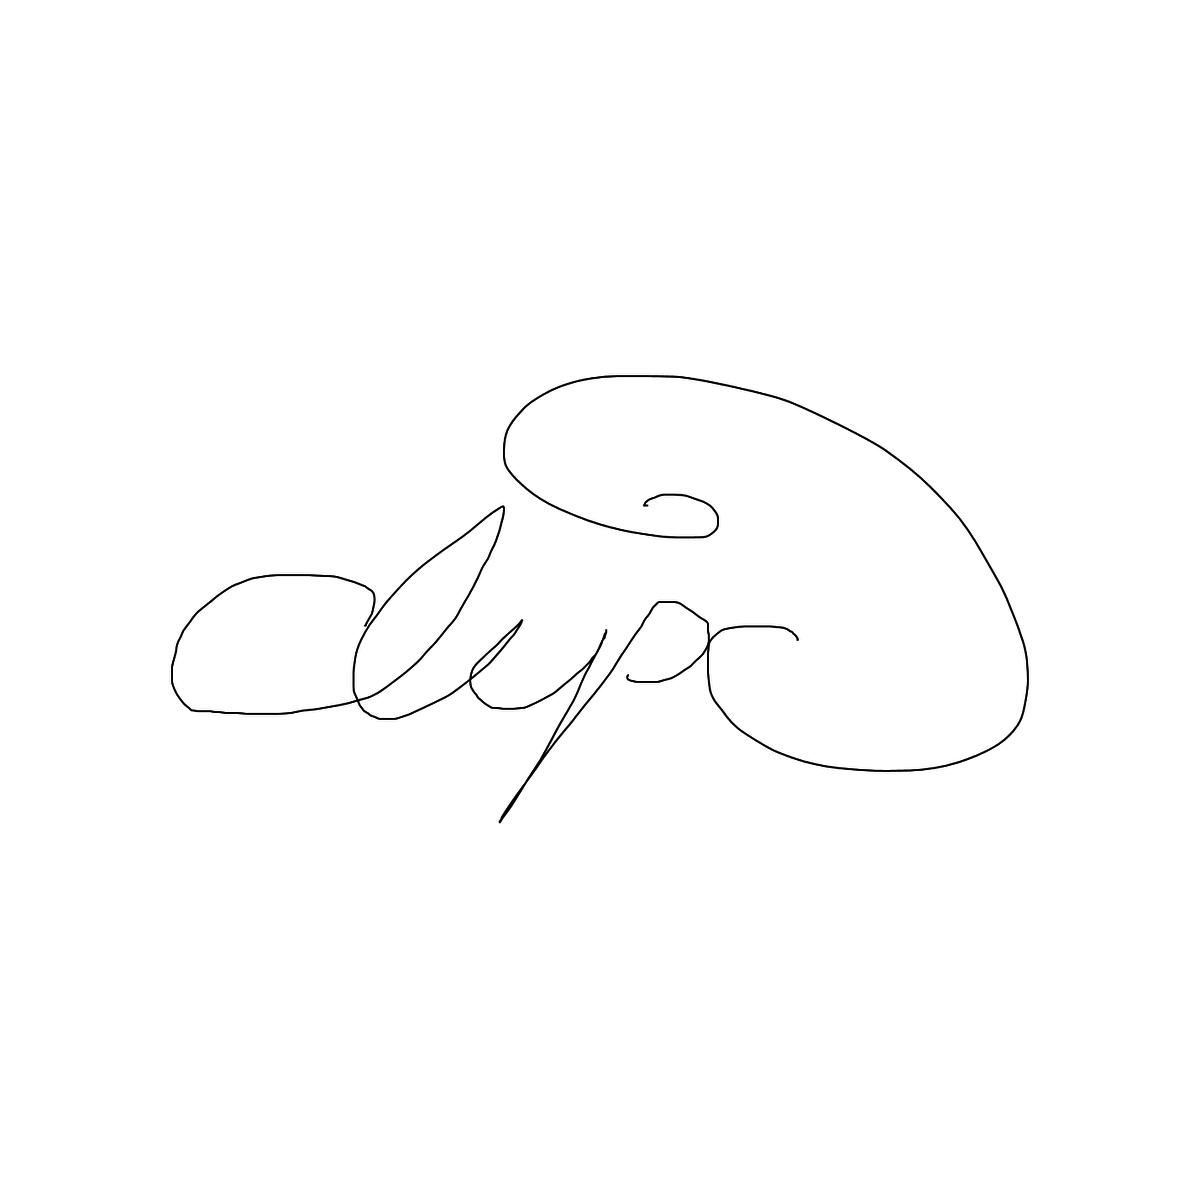 BAAAM drawing#1585 lat:51.3886528015136700lng: 22.1863021850585940